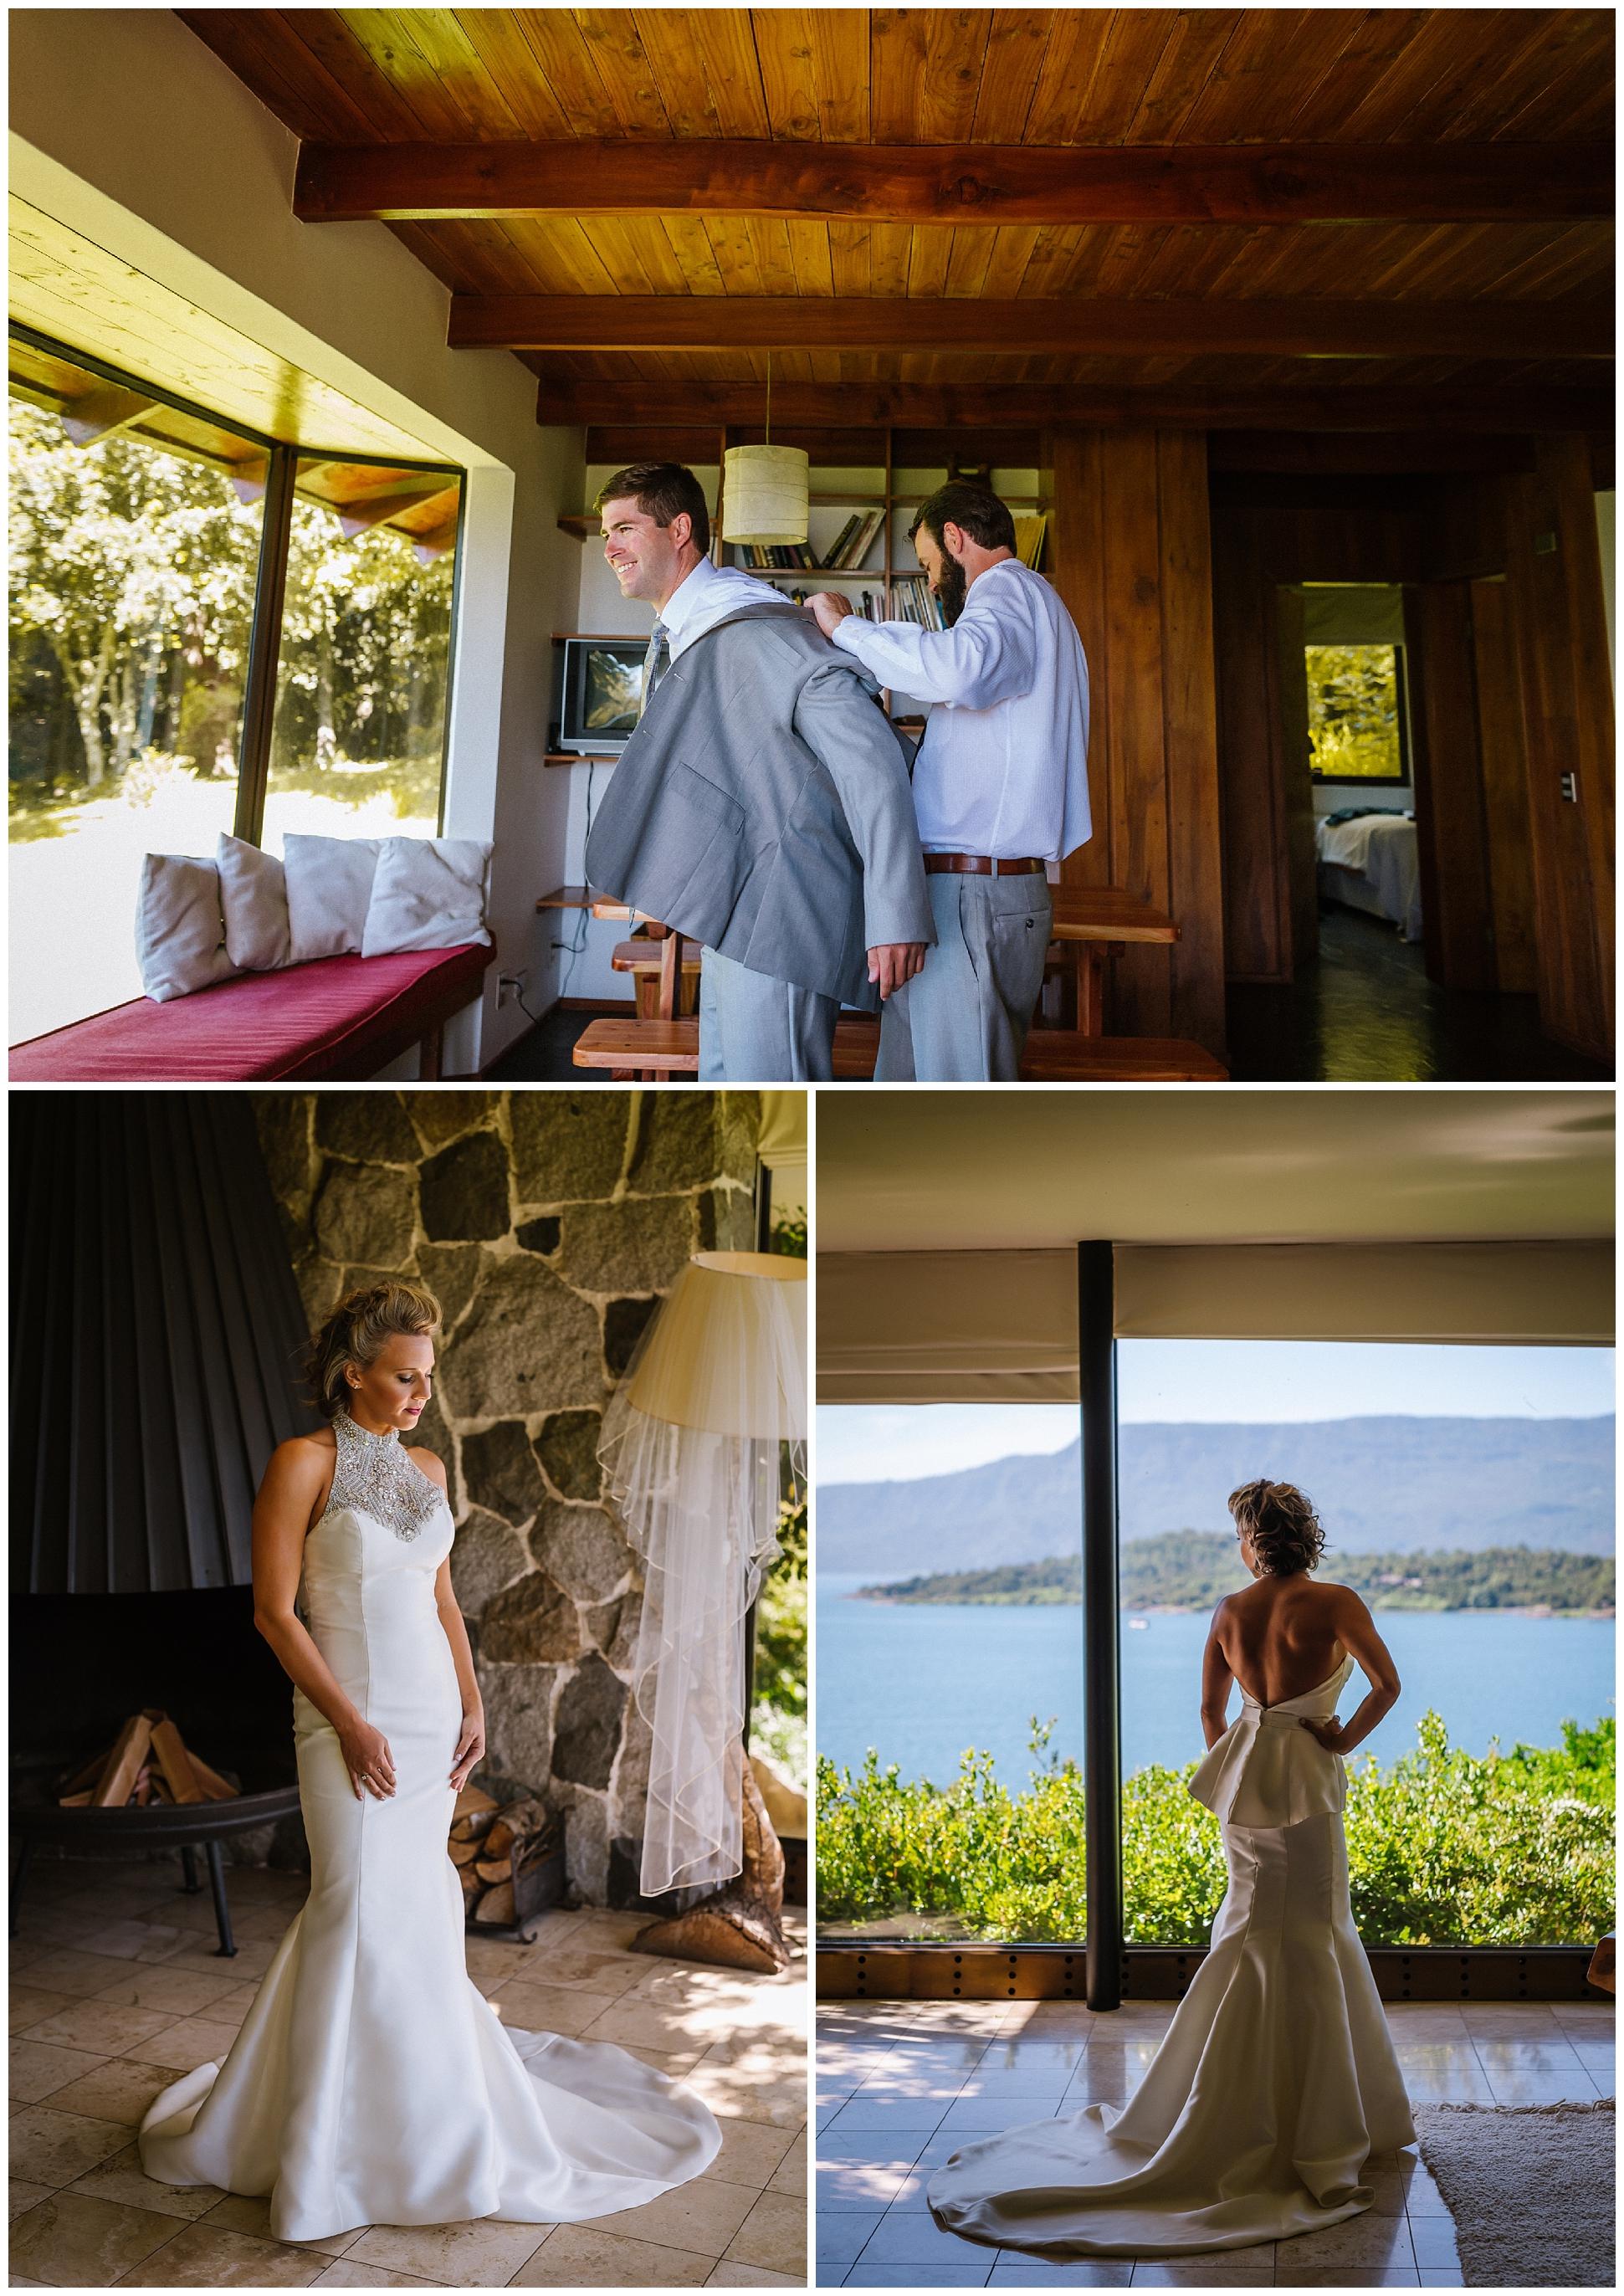 Ashlee-hamon-photography-year-in-review-2016-travel-wanderlust-vsco-adventure-wedding_0079.jpg